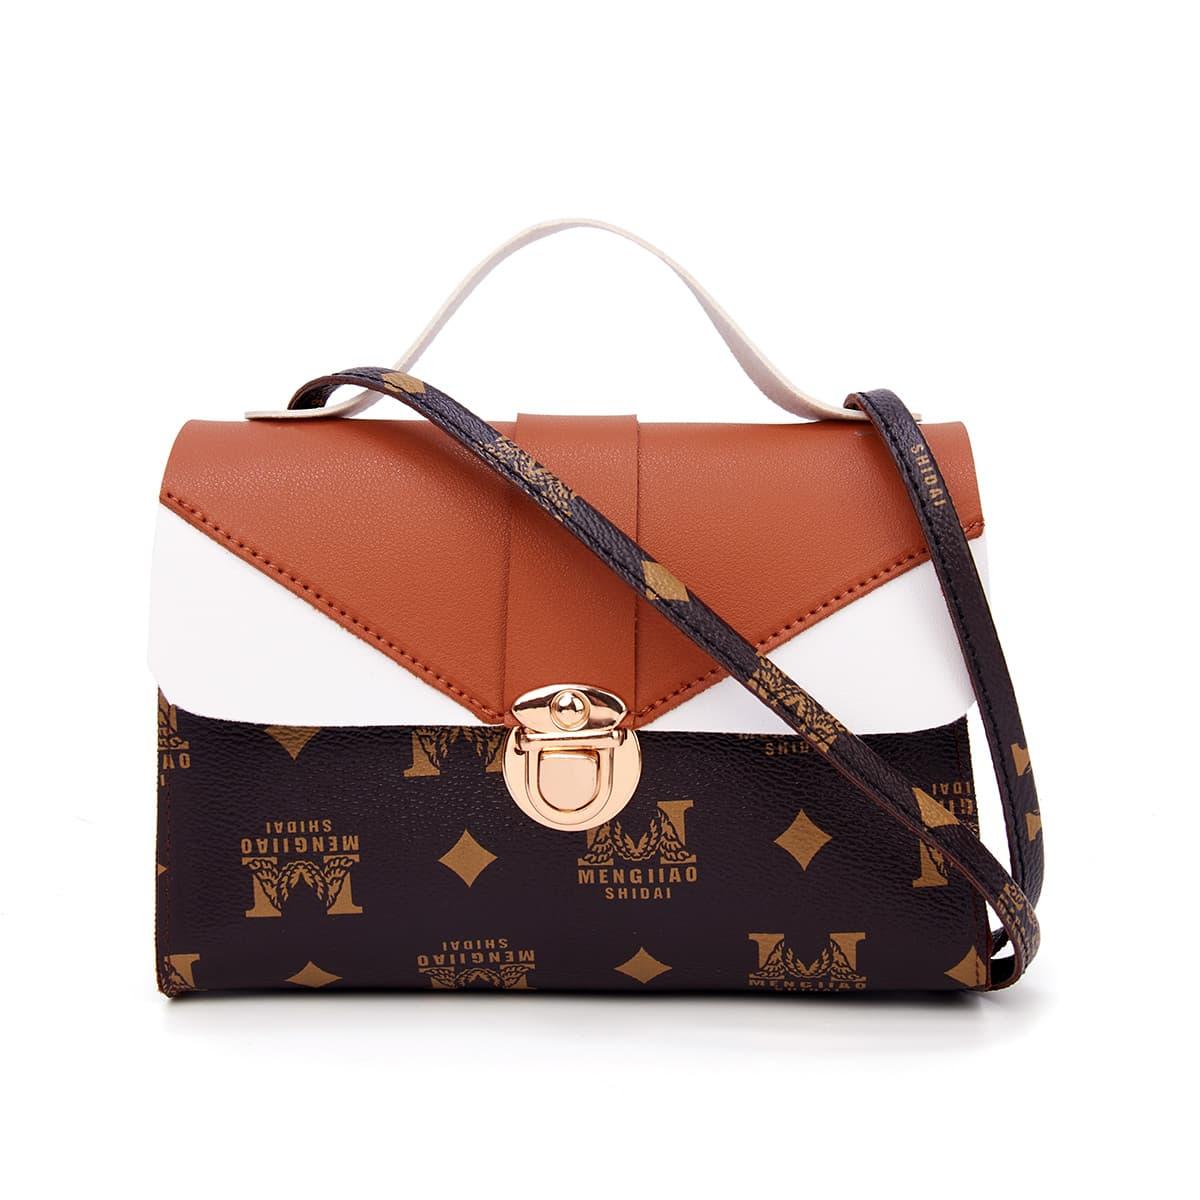 SHEIN / Push Lock Graphic Satchel Bag